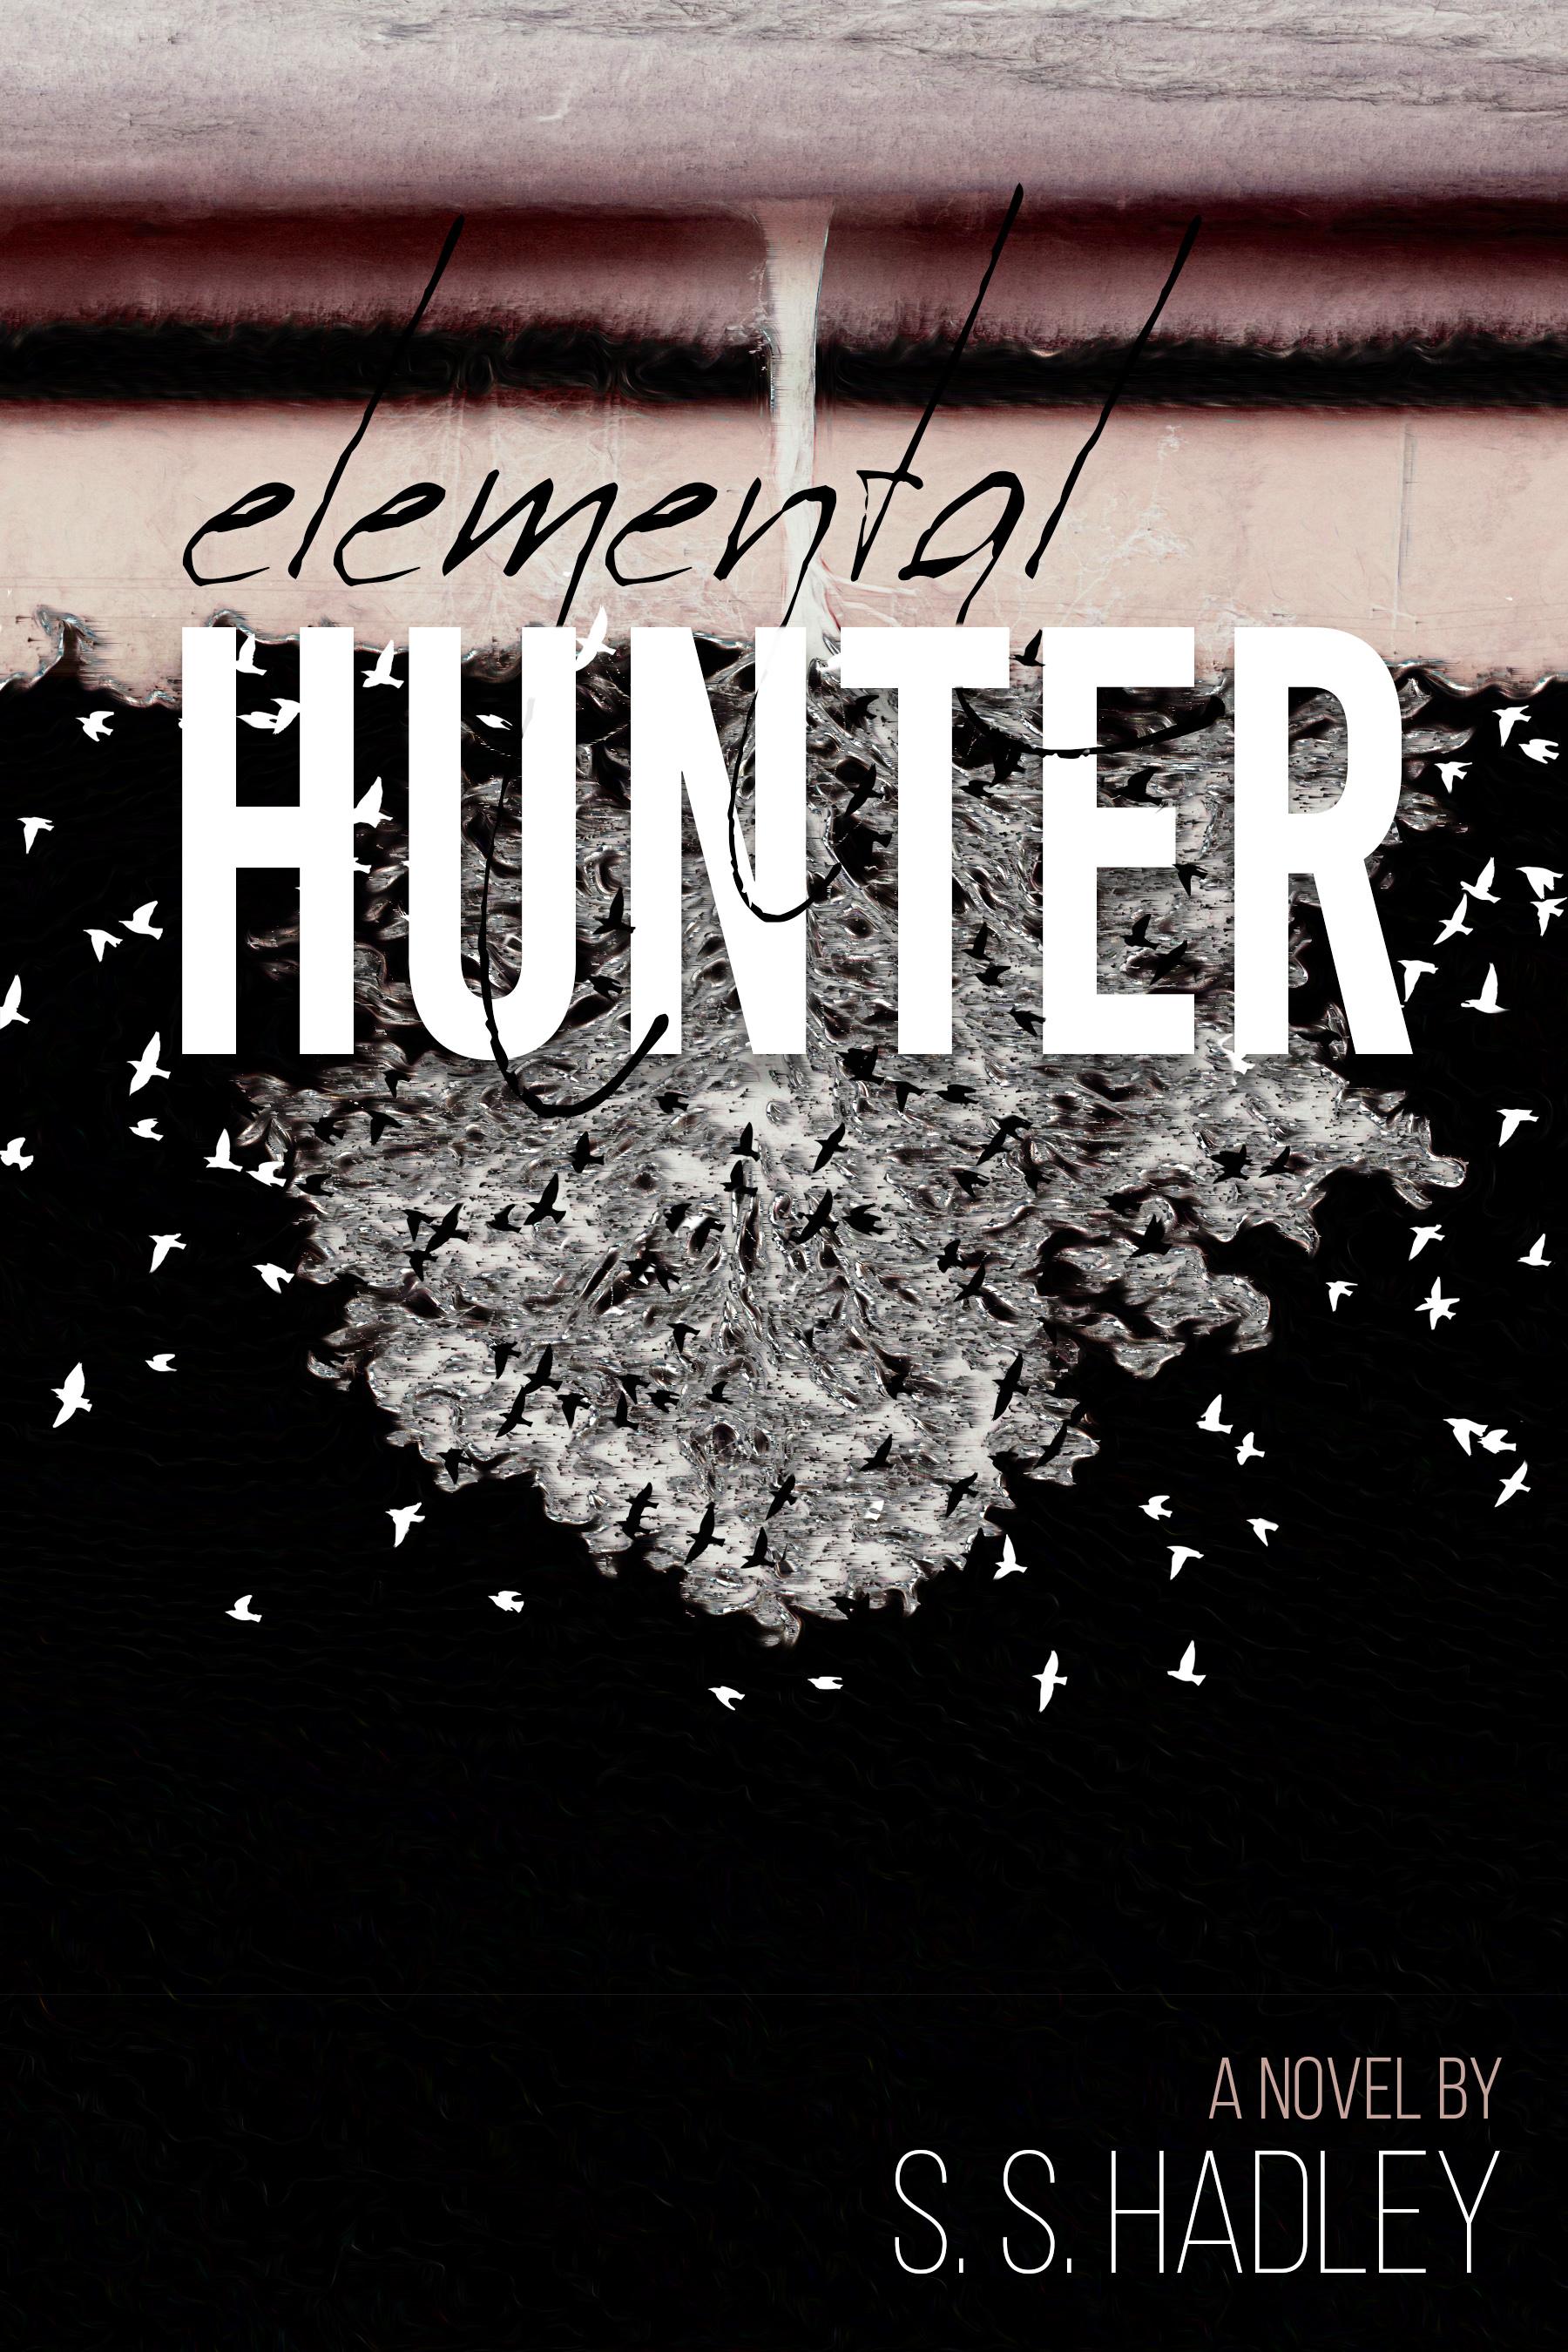 """Elemental Hunter"" February 2019  Book cover art"